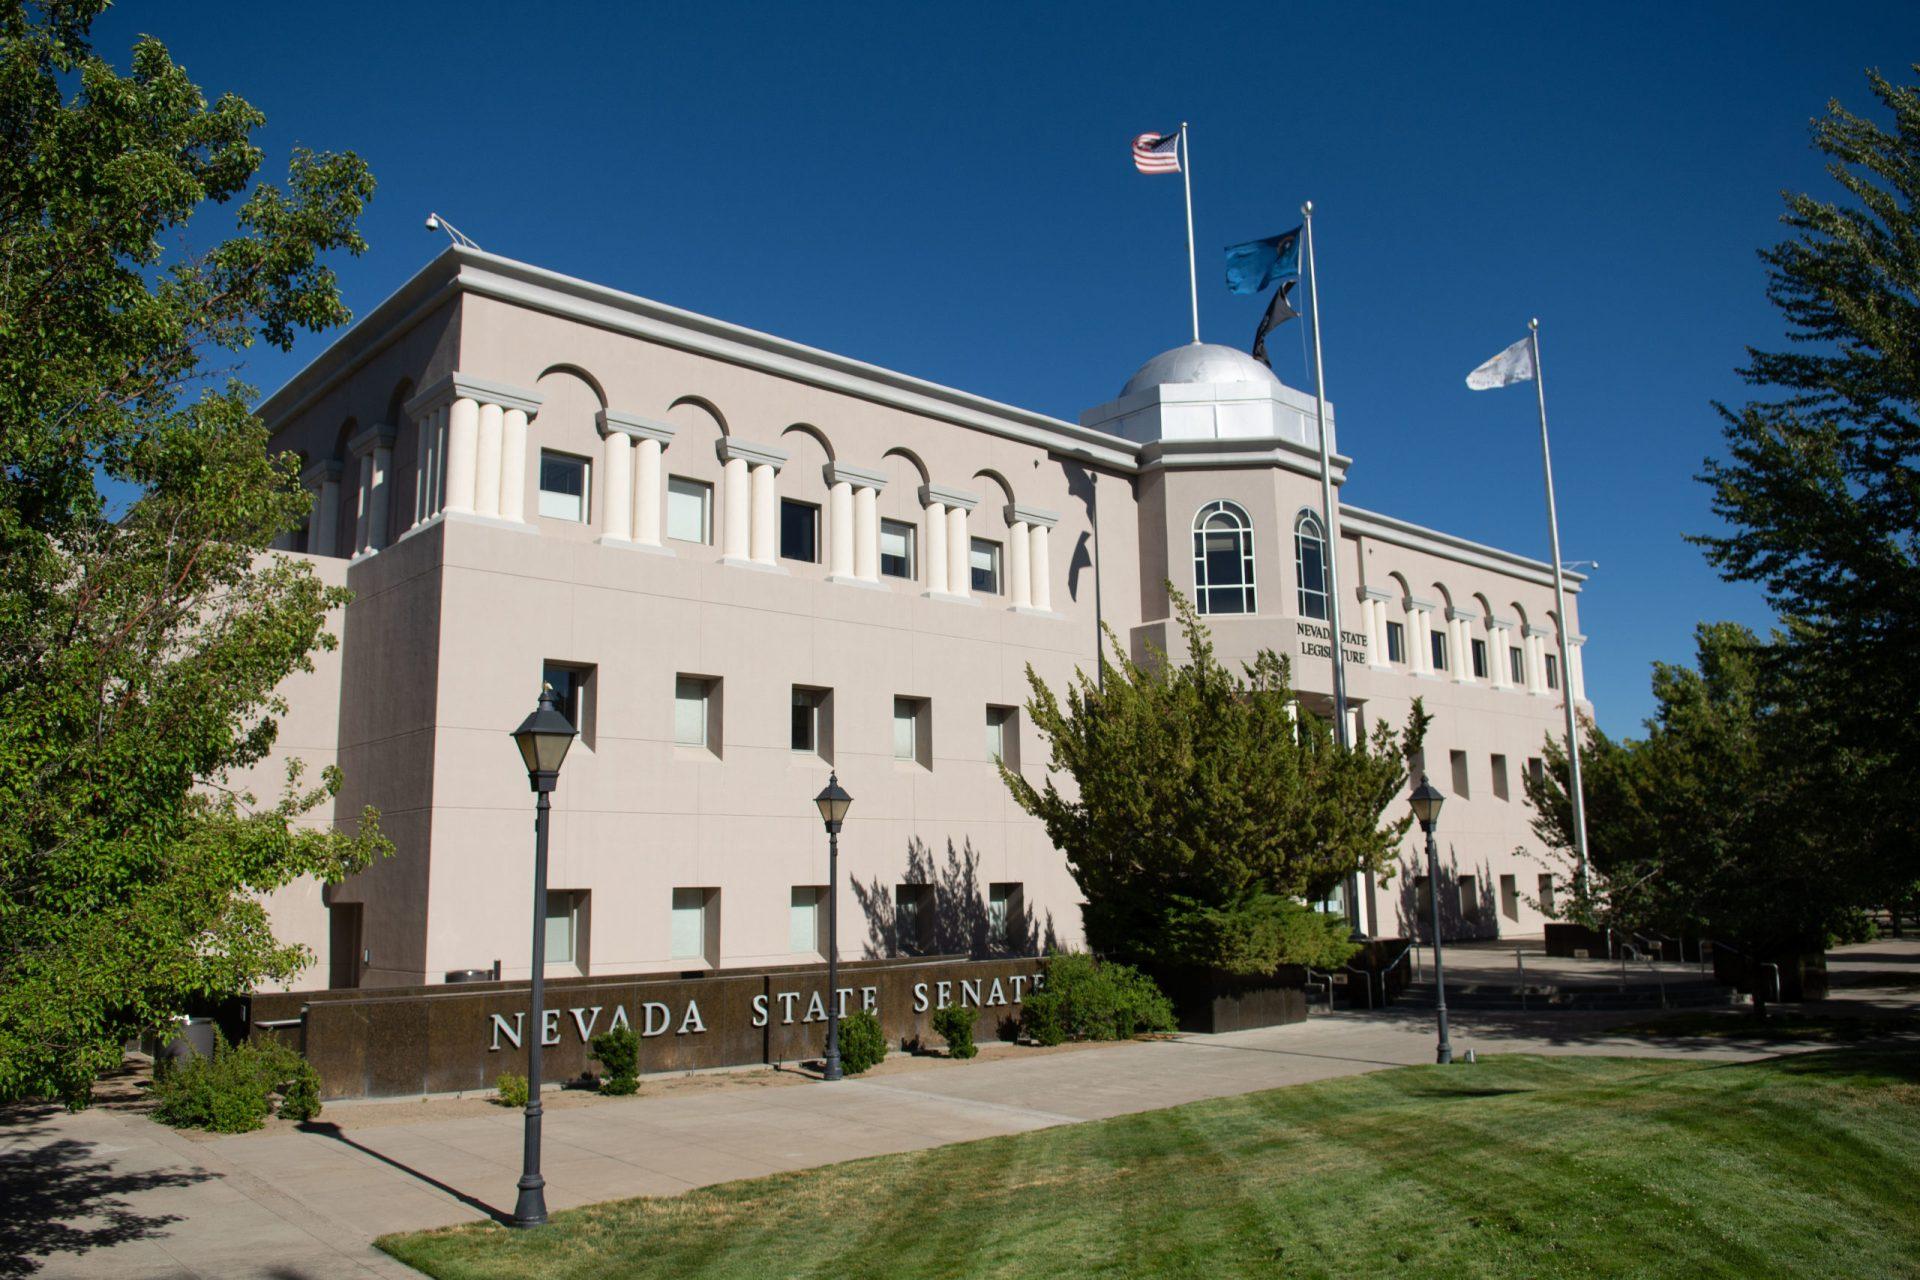 Nevada State Senate Building